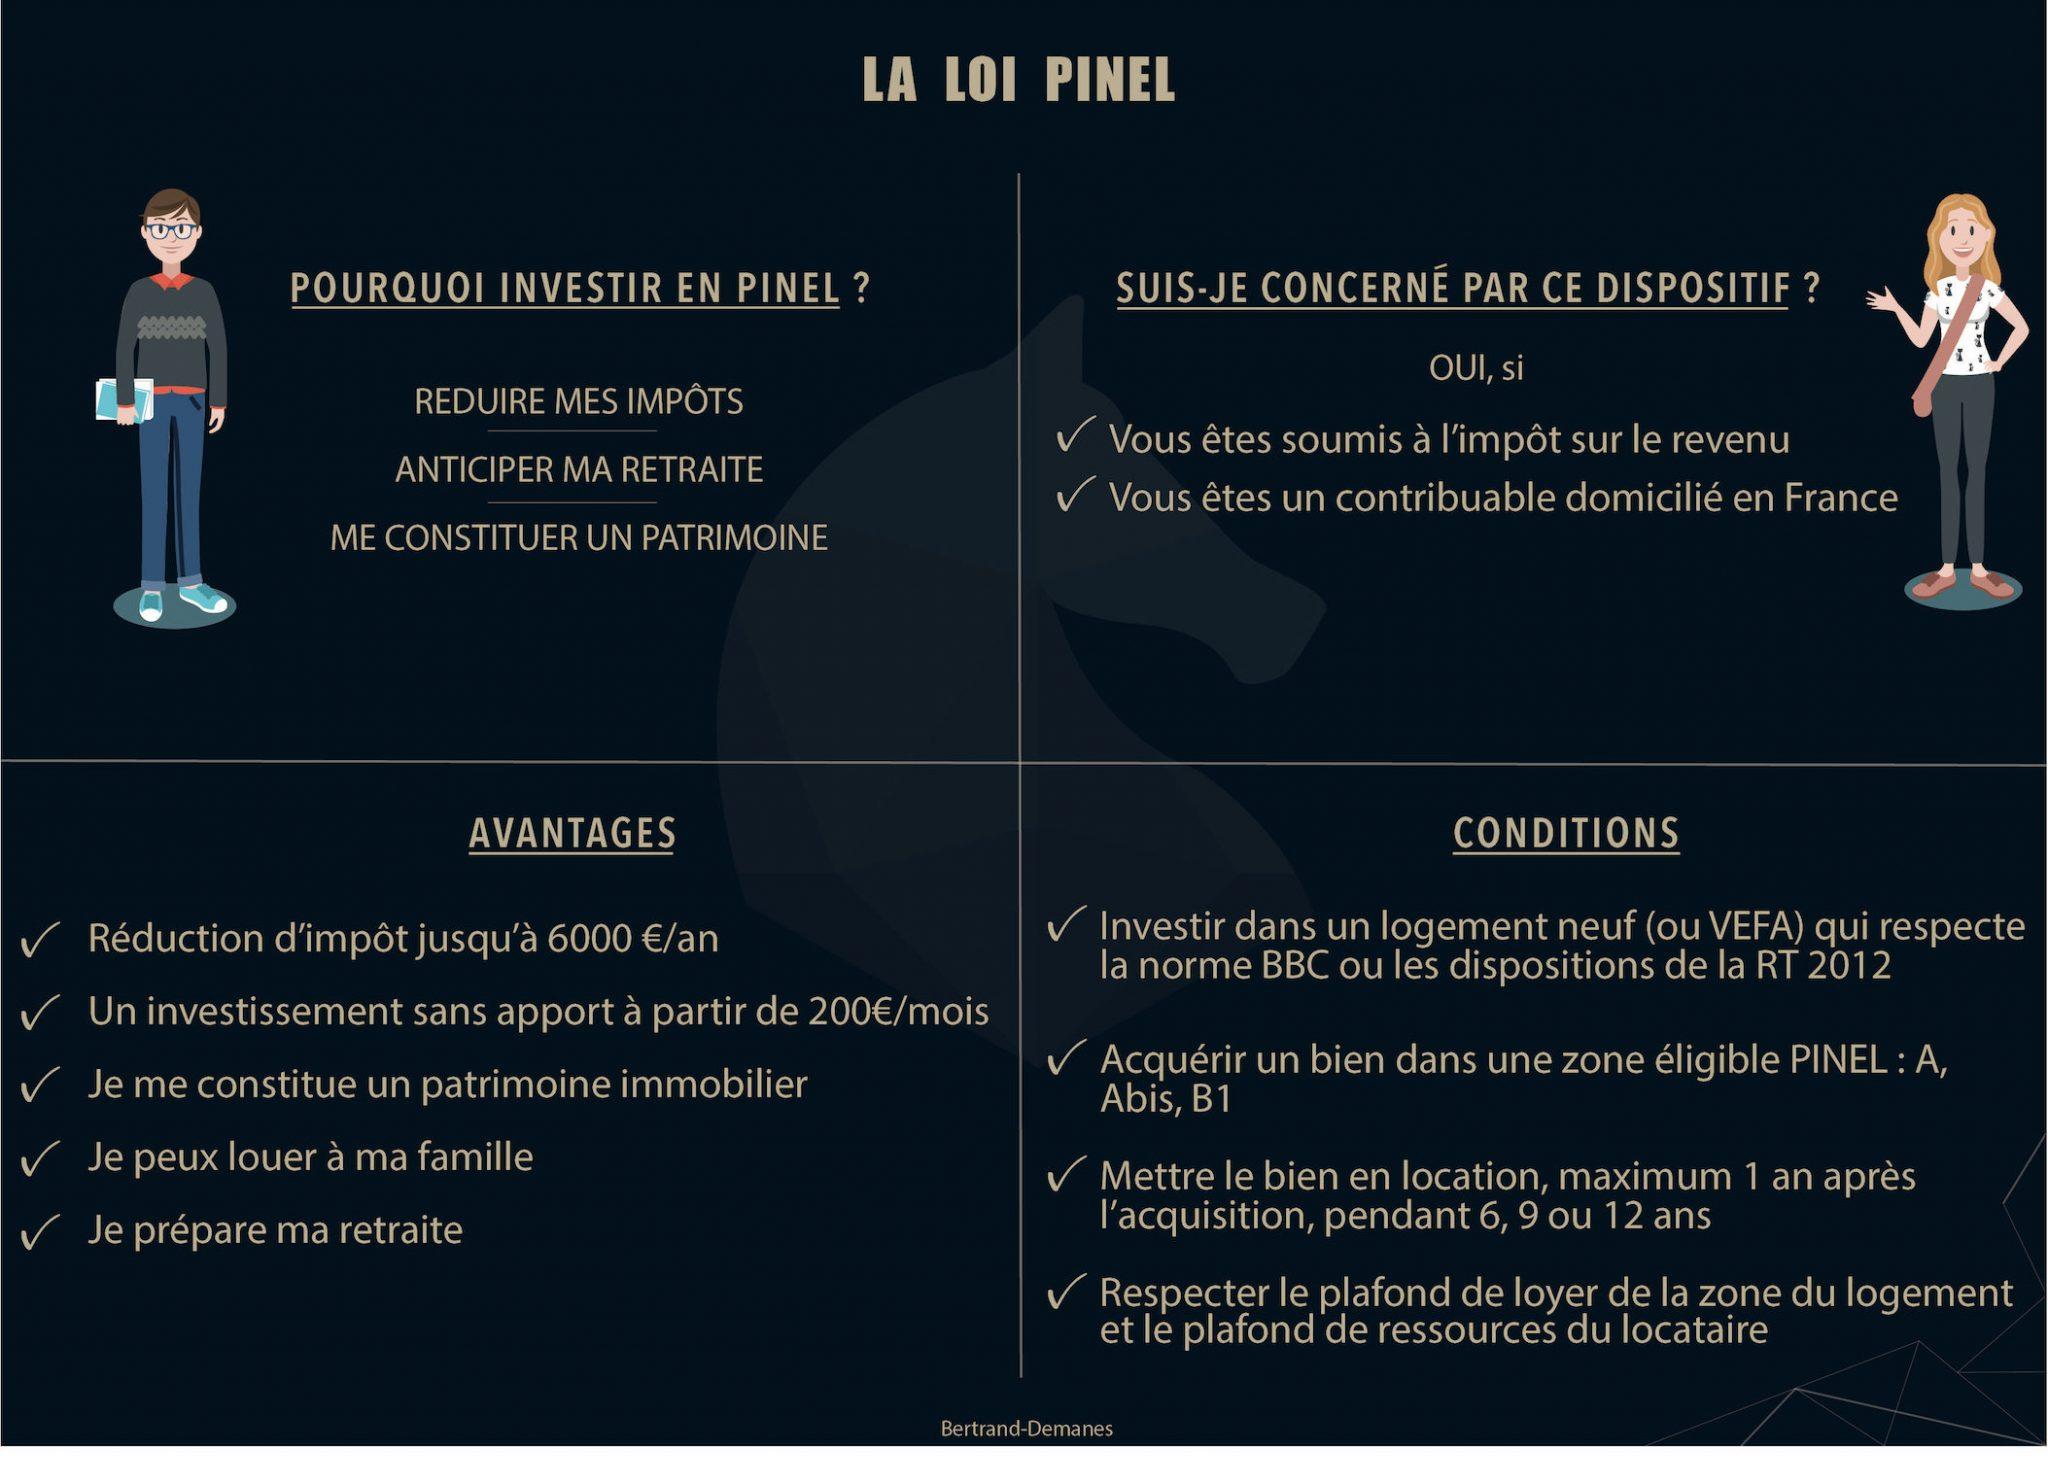 infographie-loi-pinel-vannes-bertrand-demanes